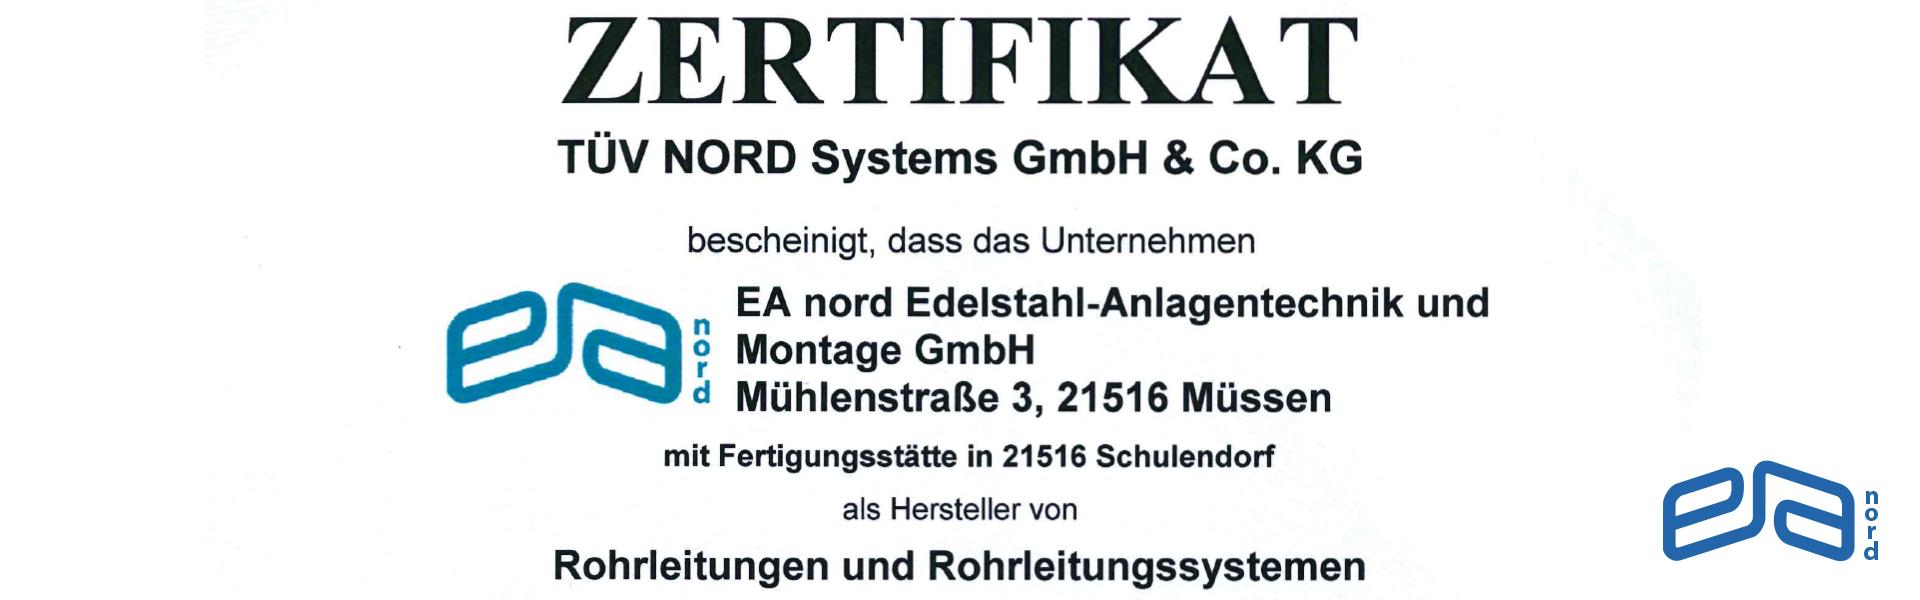 ea-nord-zertifikate-03